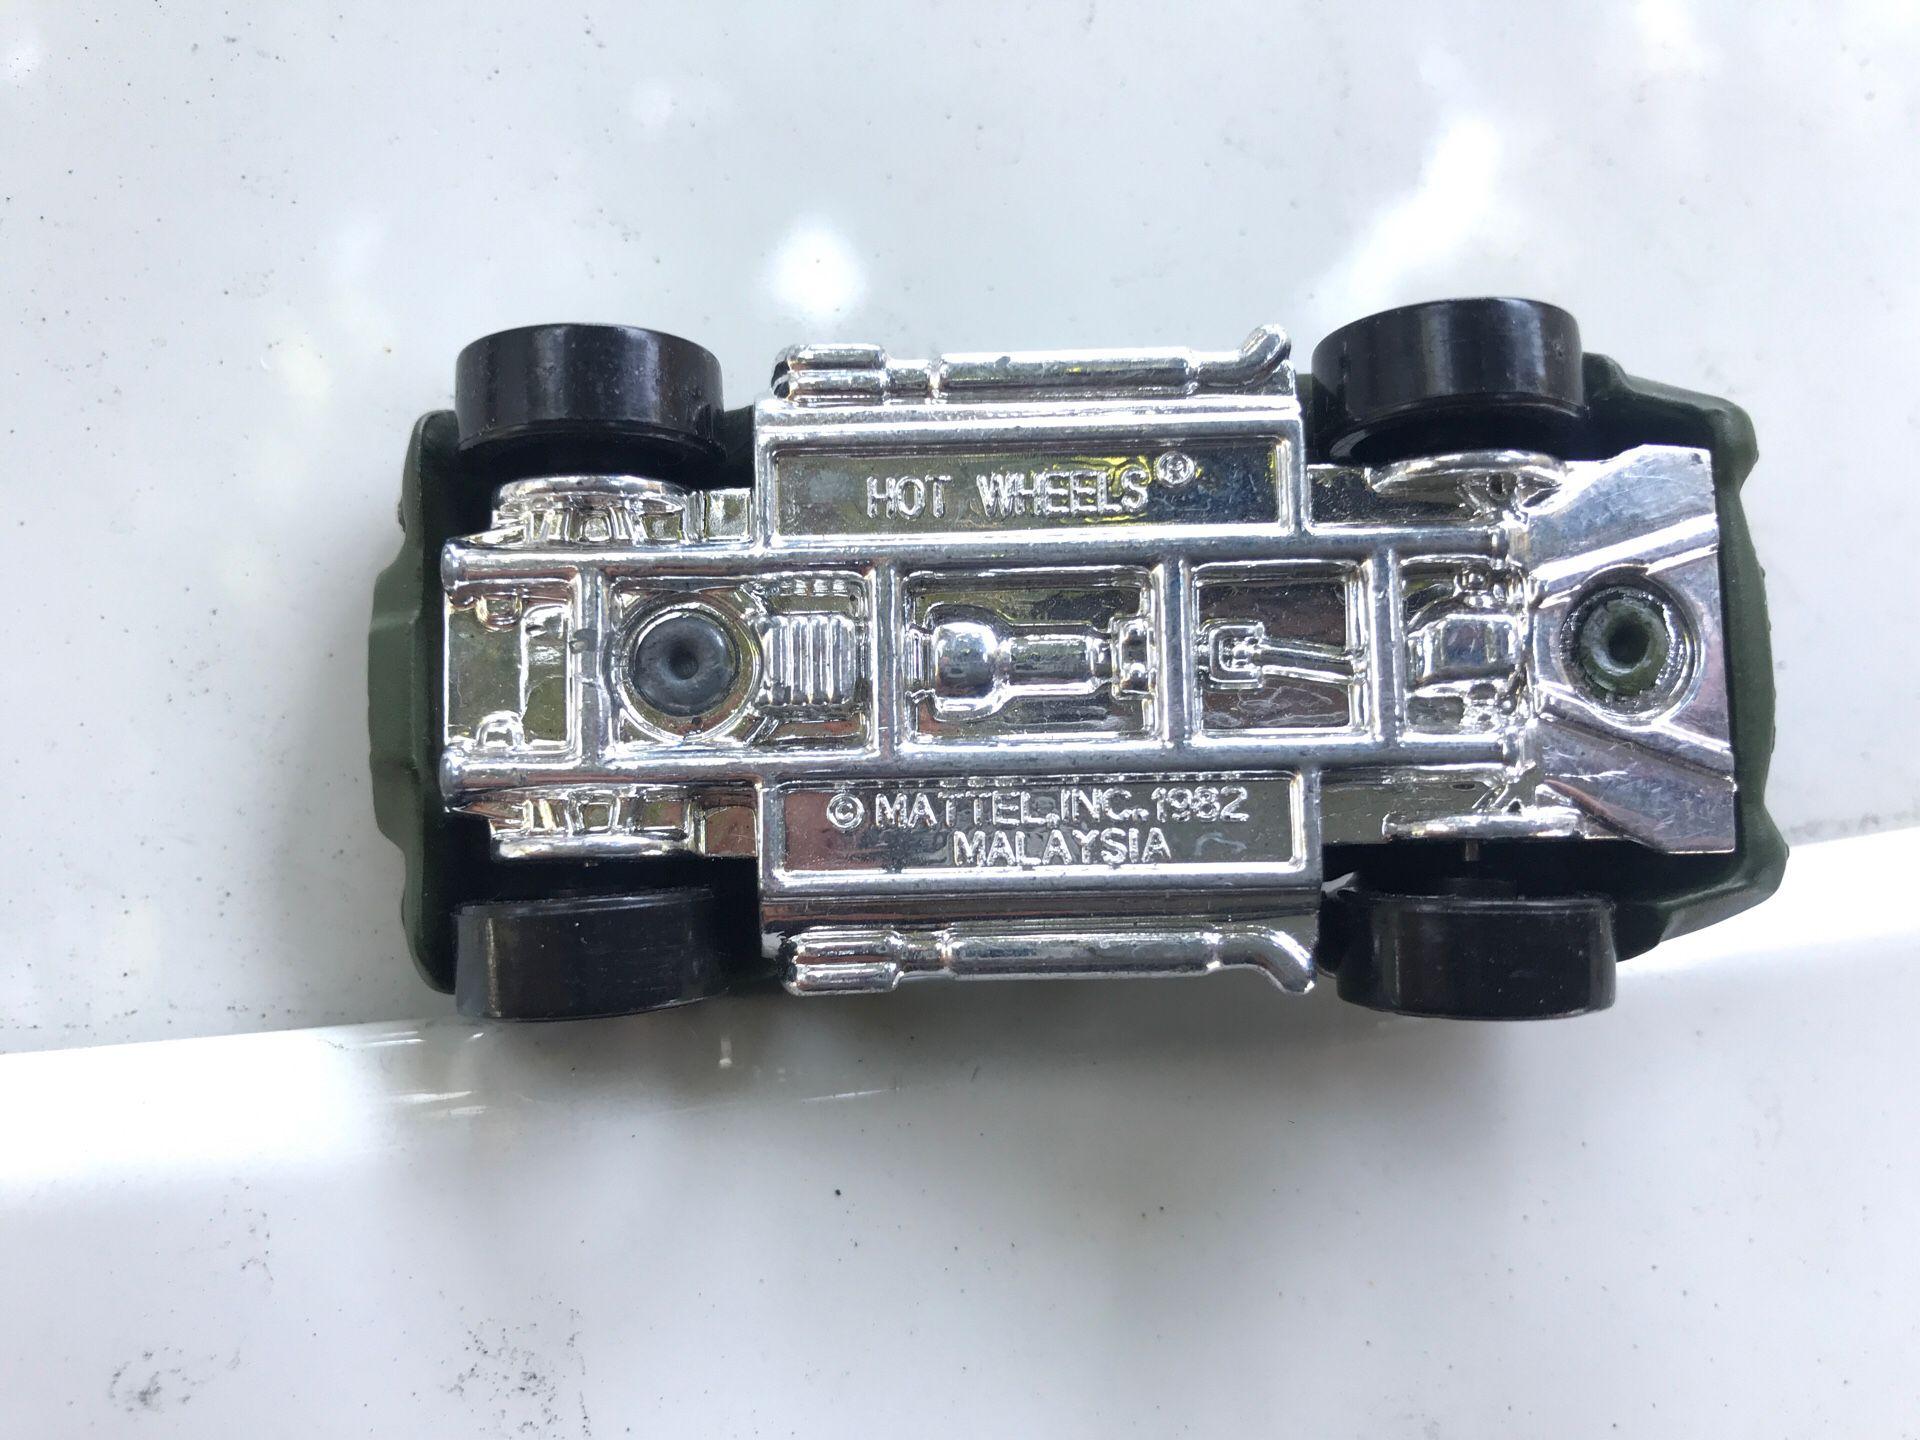 1982 Shelby cobra army hot wheels